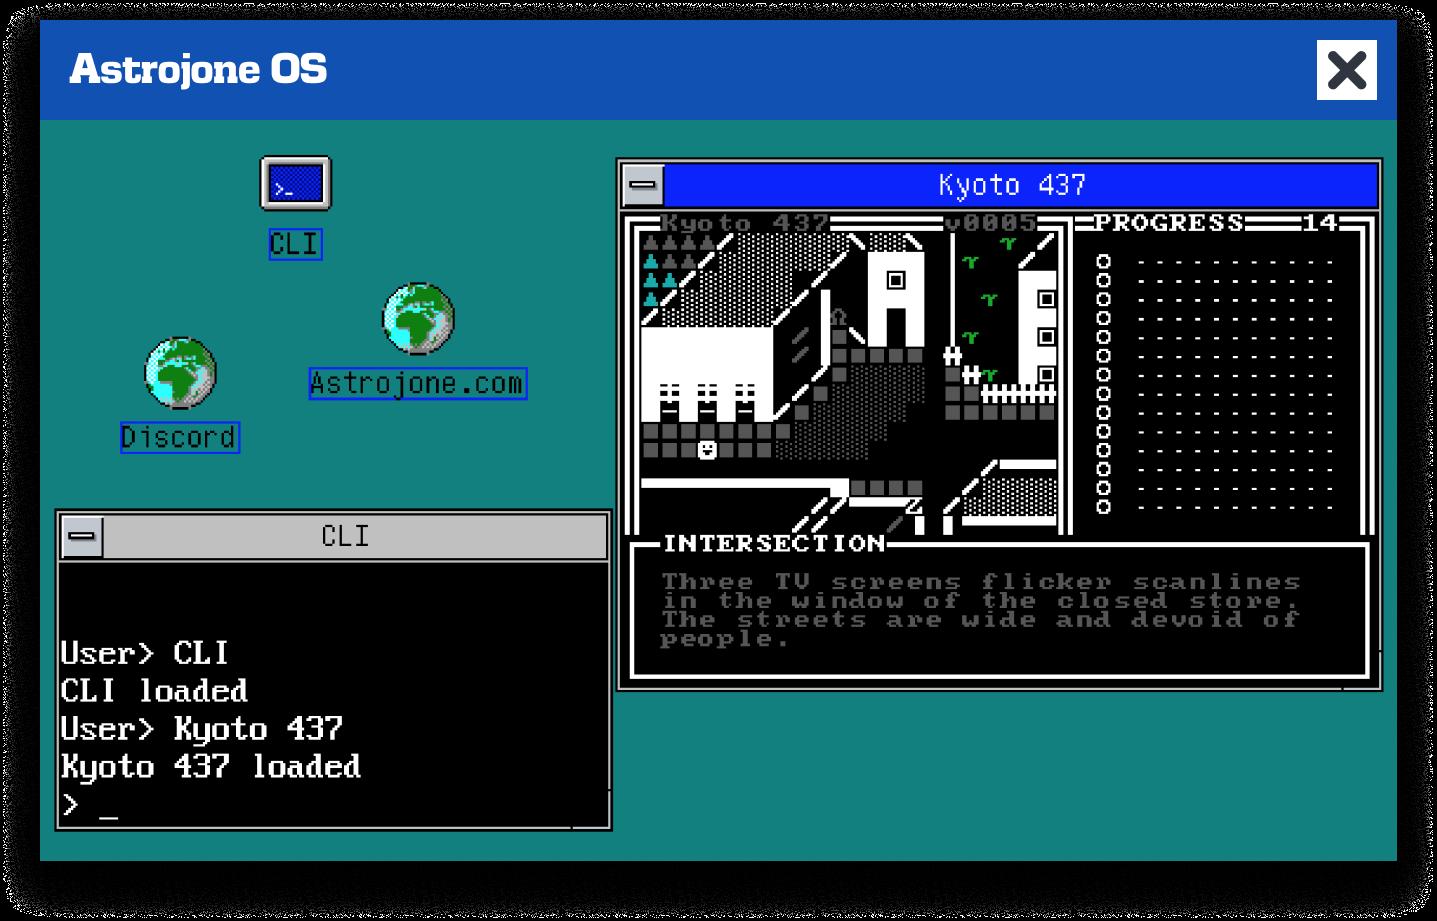 Astrojone OS Clipart - Screenshot